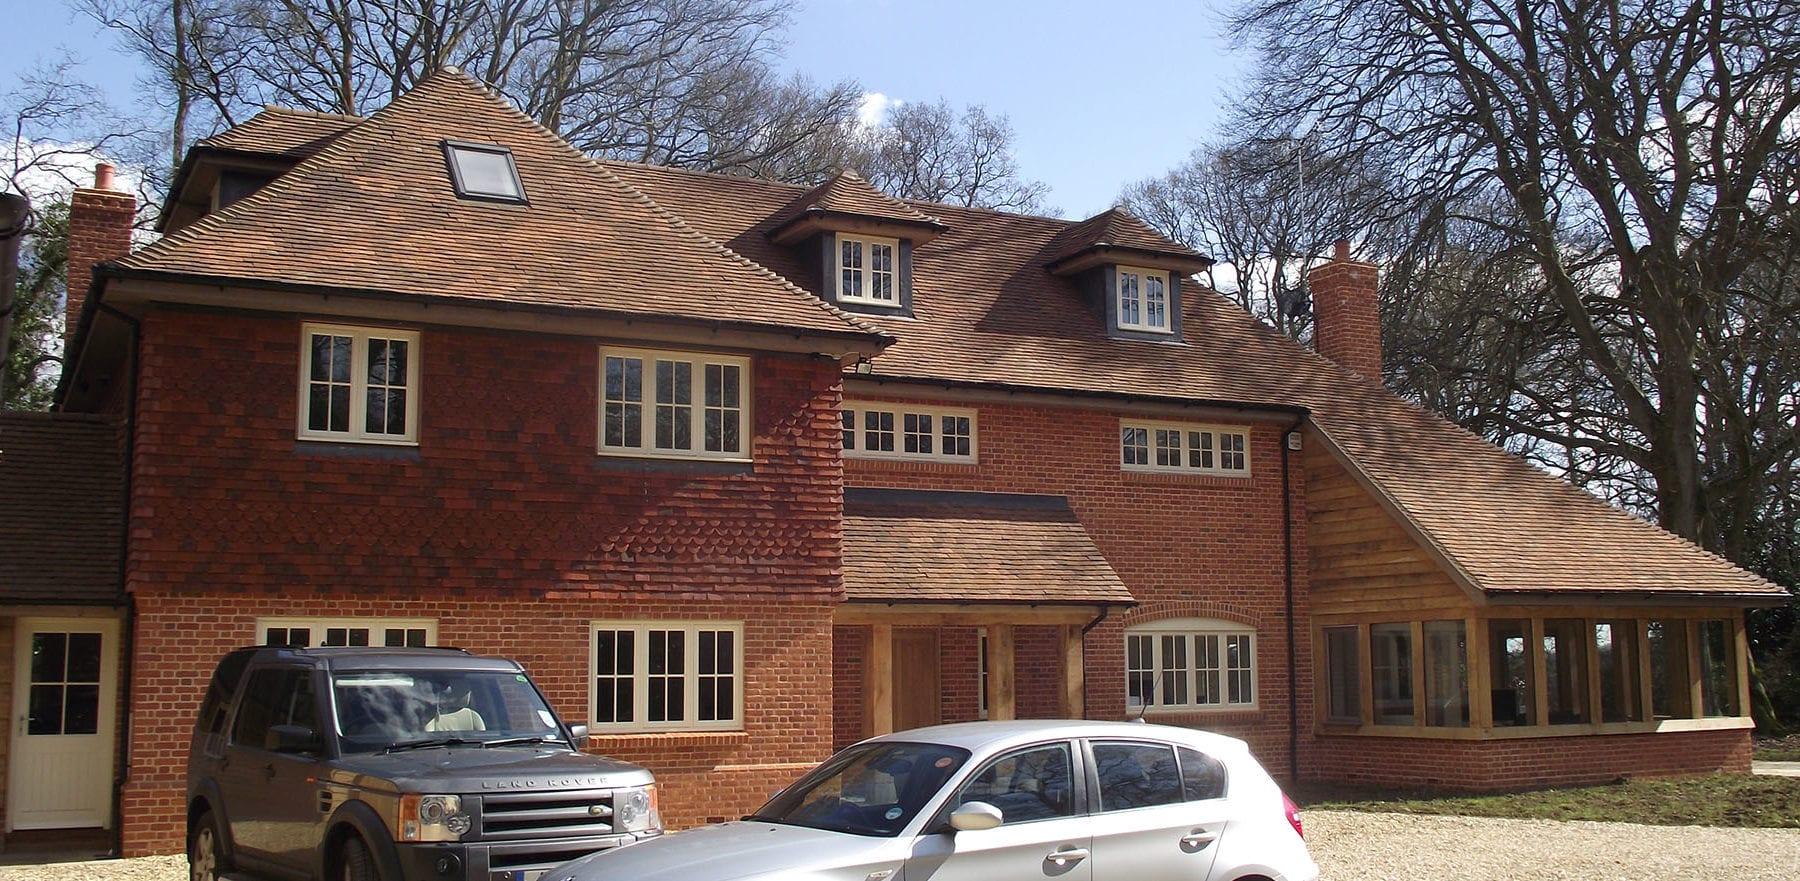 Lifestiles - Handmade Brown Clay Roof Tiles - Romsey, England 4